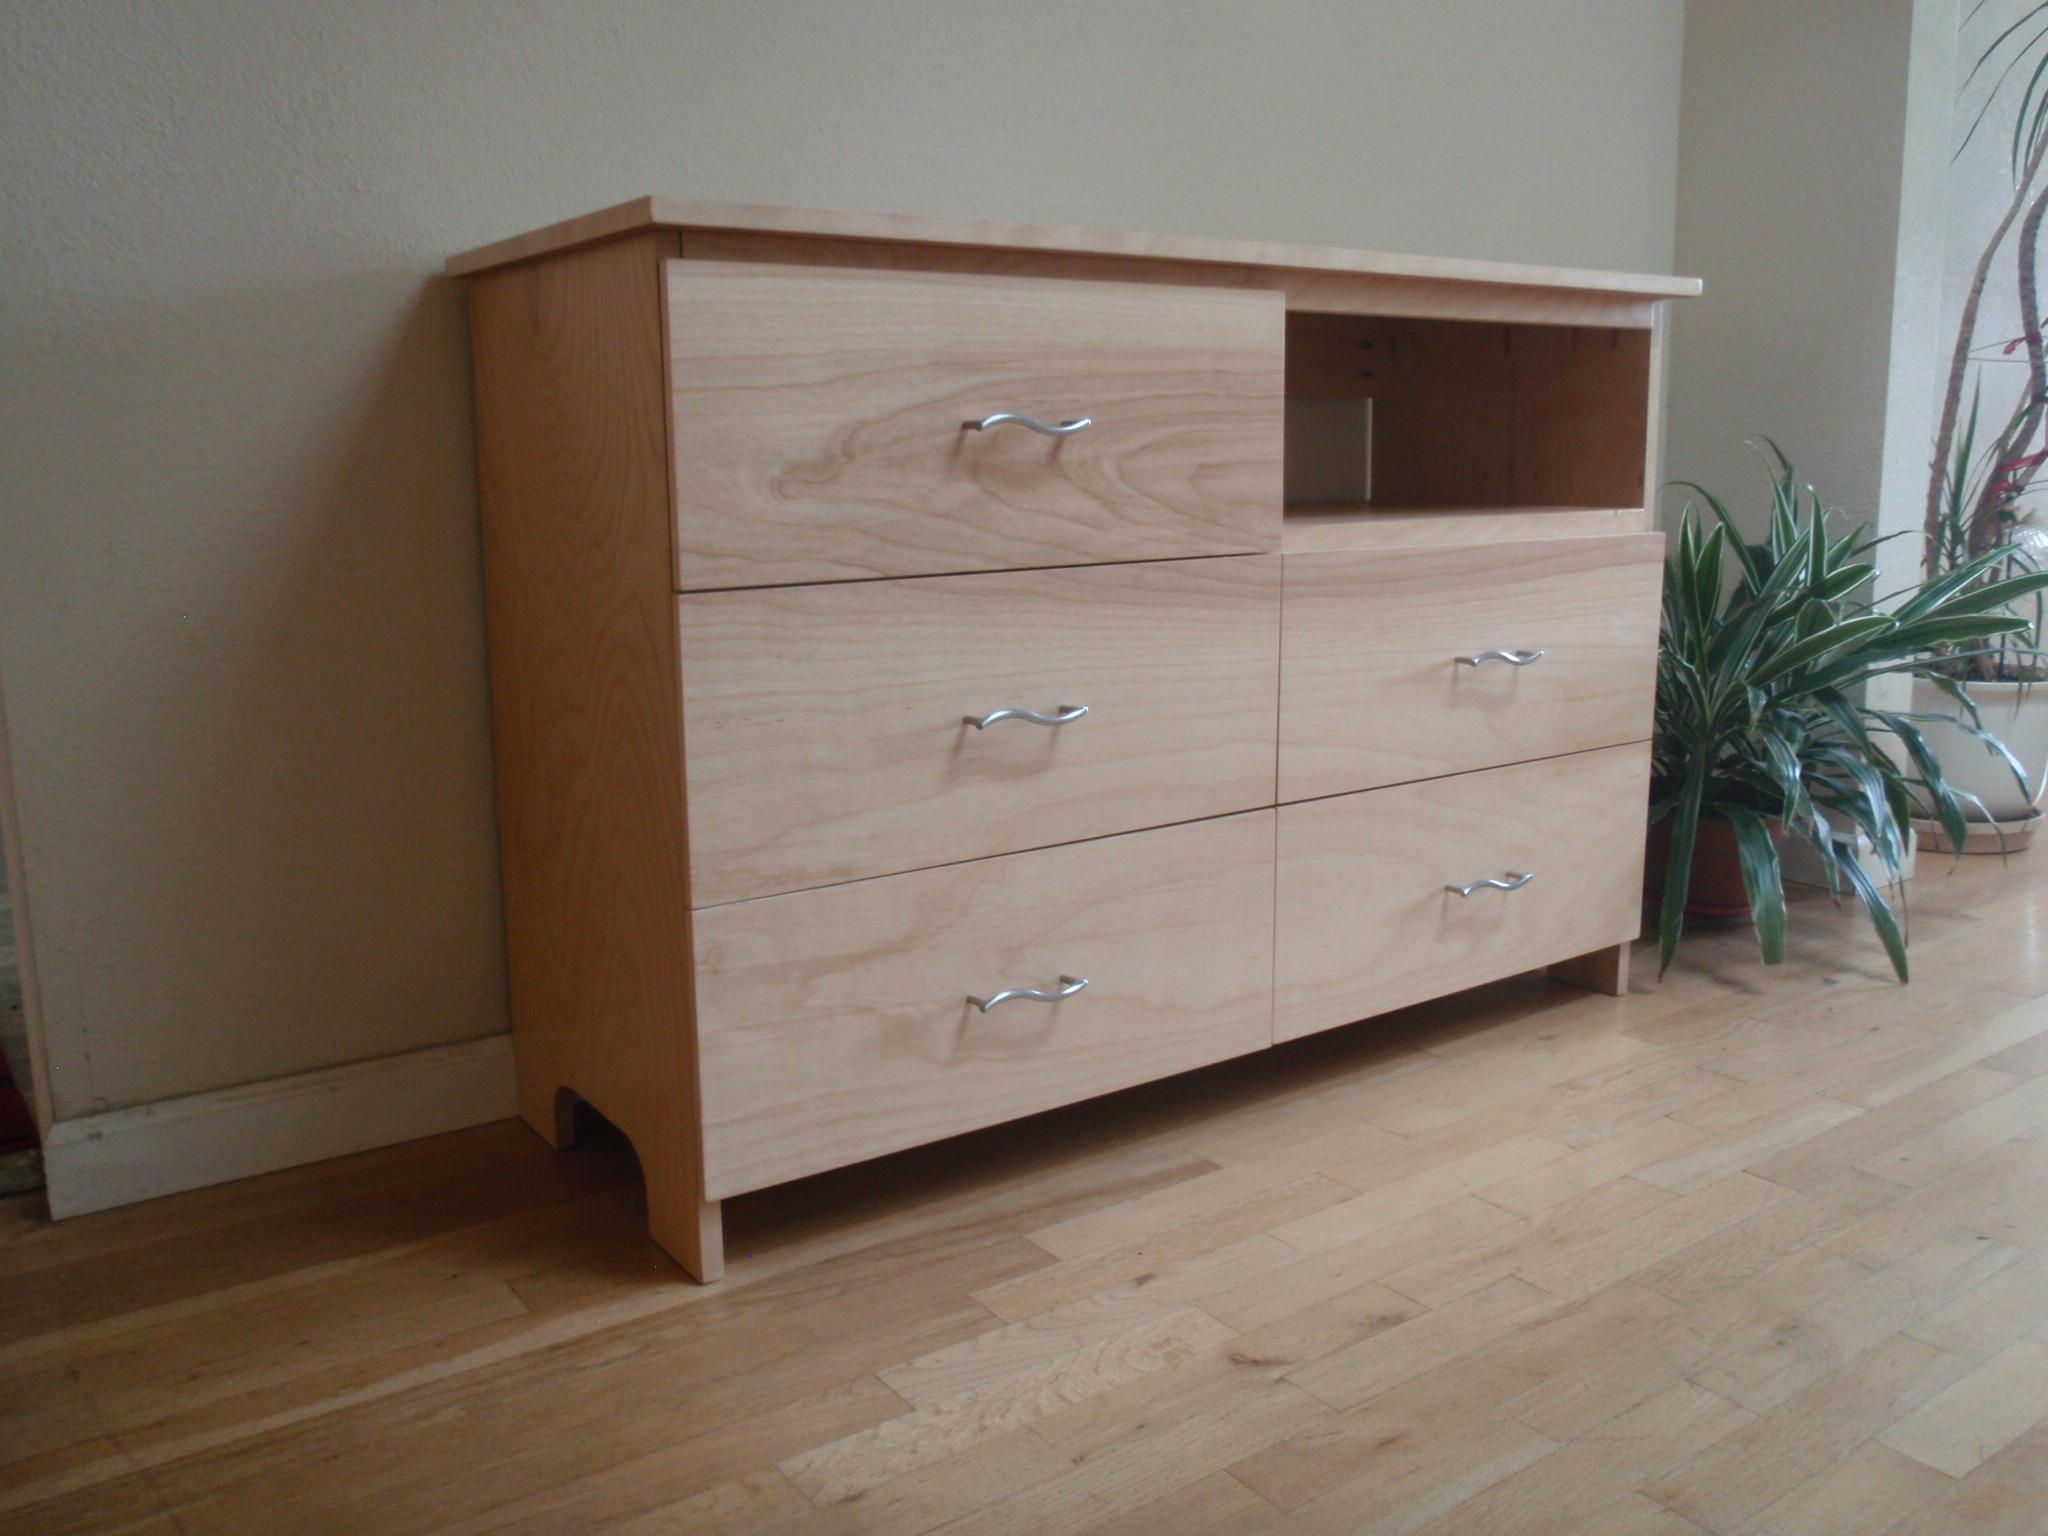 Minimalist Style Dresser with Electronics Bay